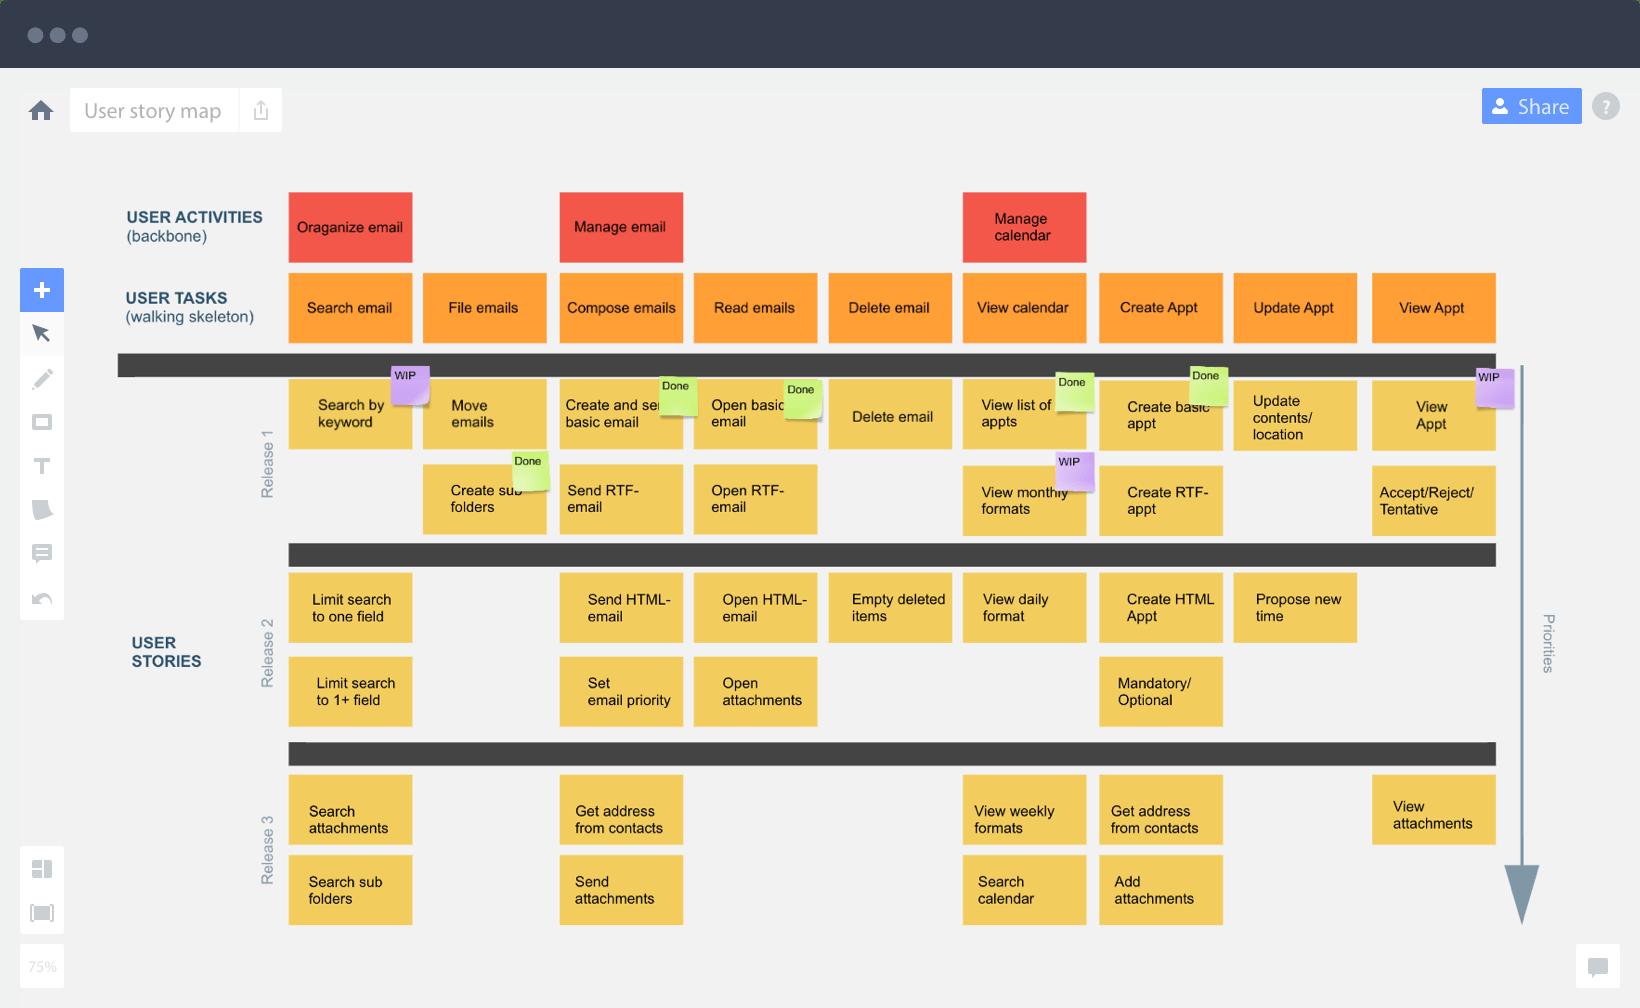 Miro Software - User story map